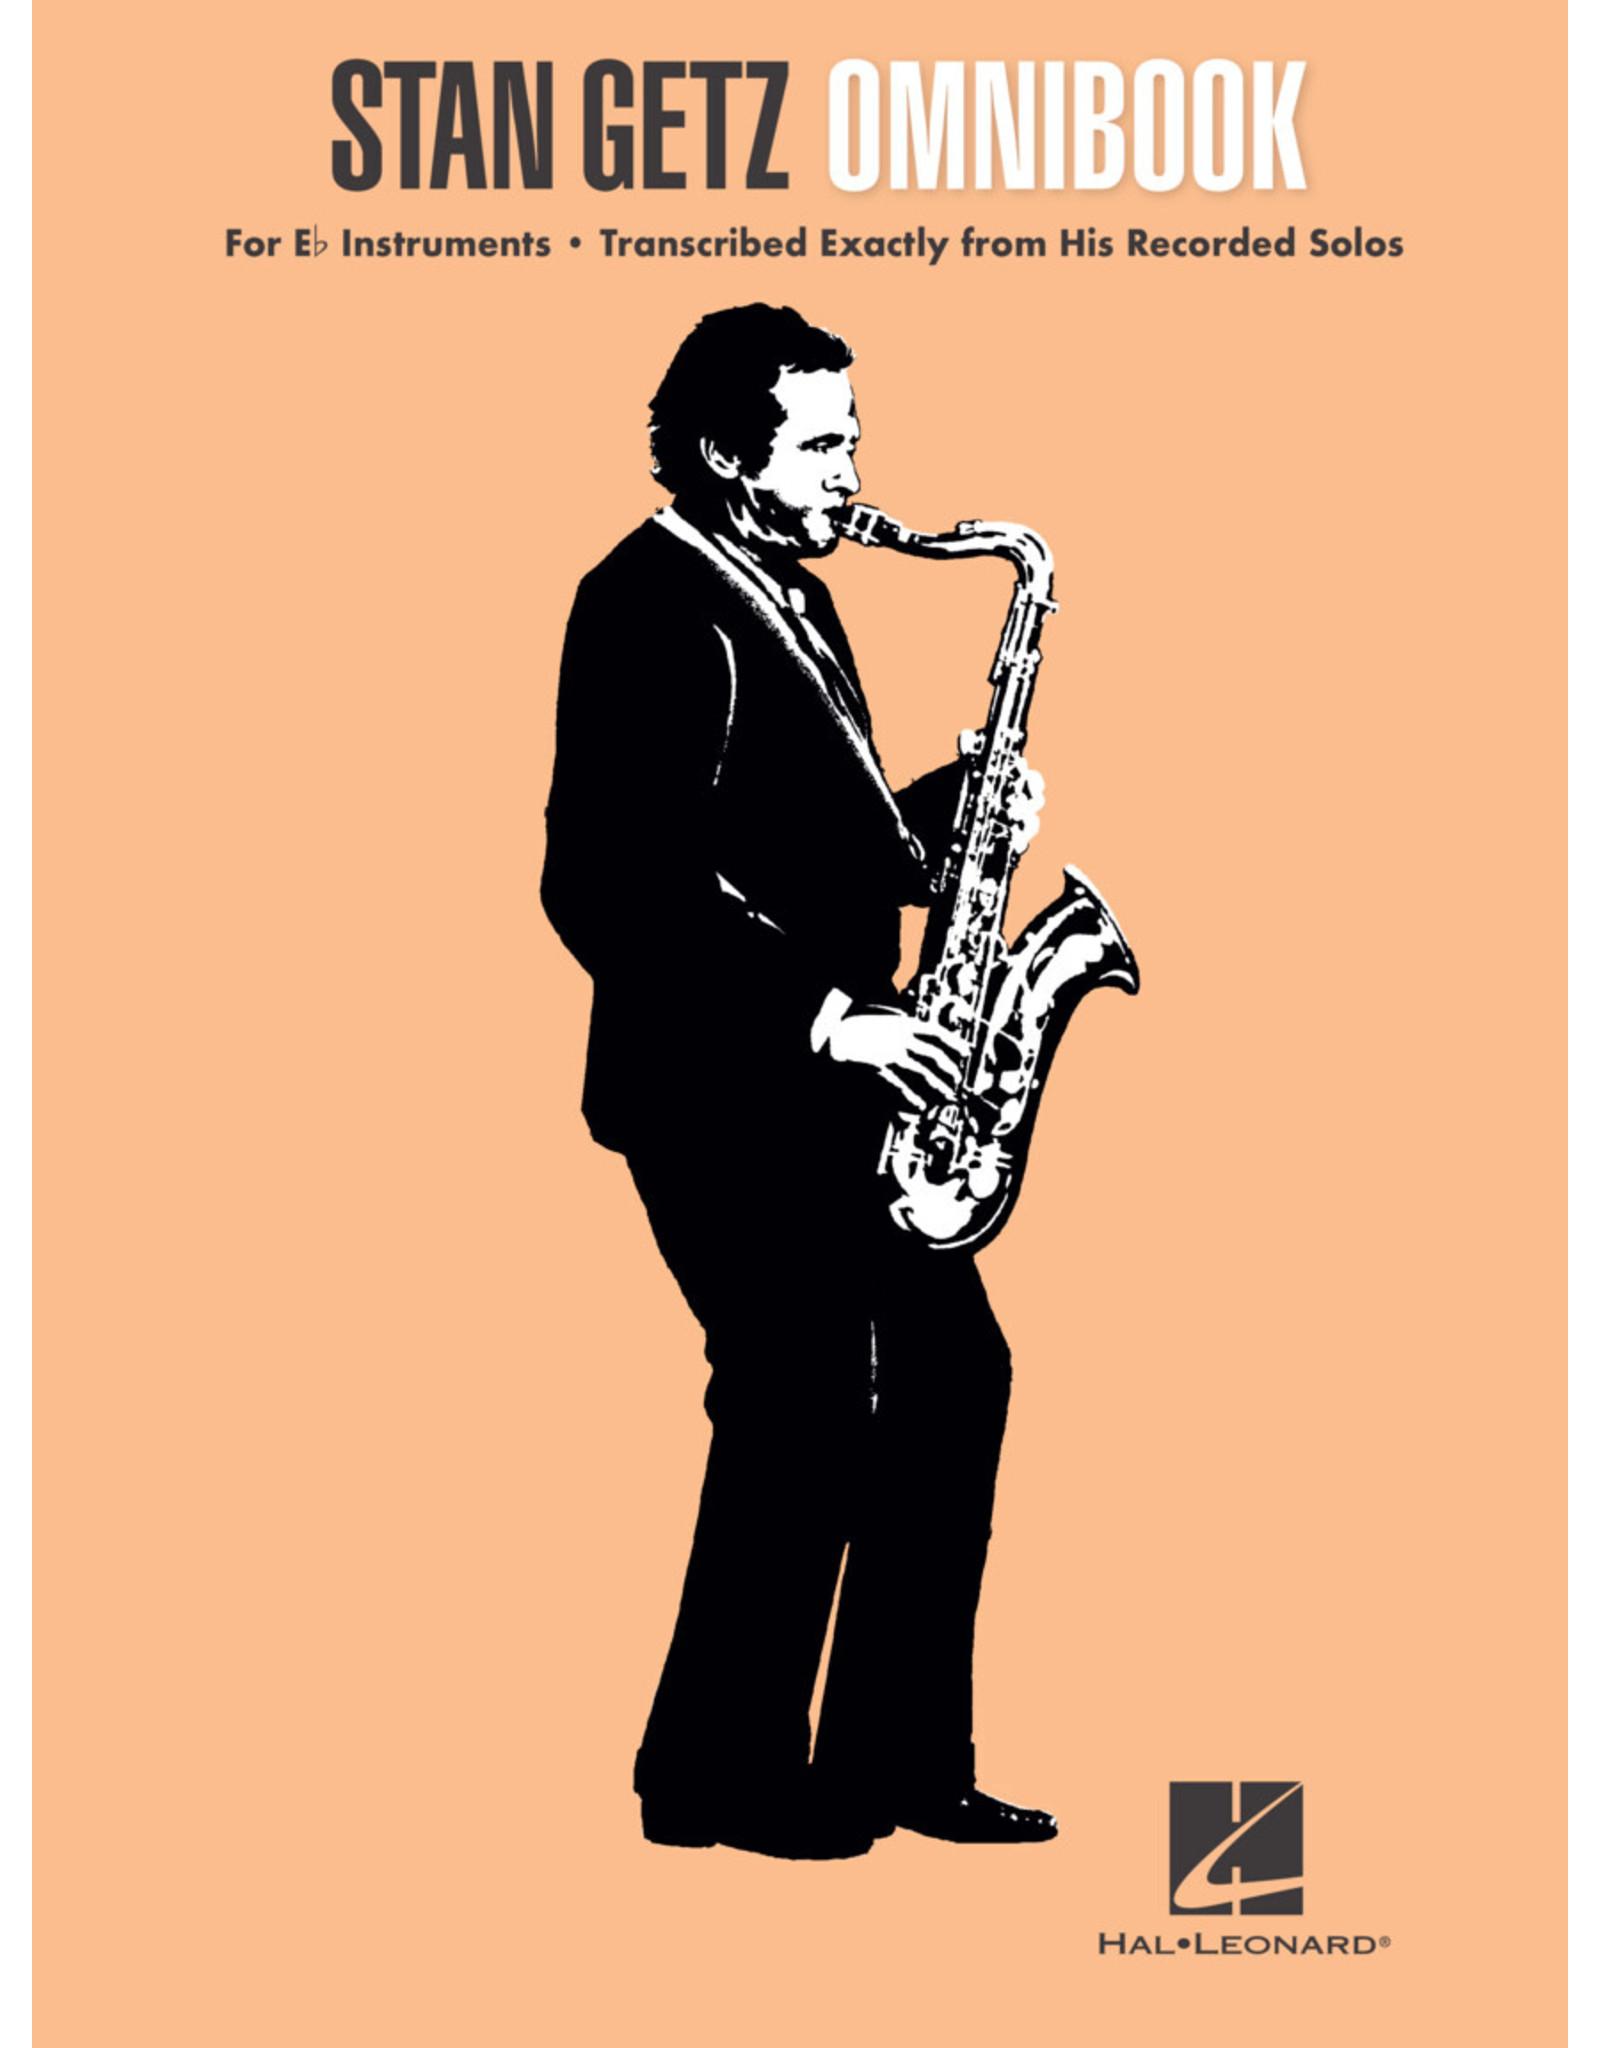 Hal Leonard Stan Getz Omnibook for Eb Instruments